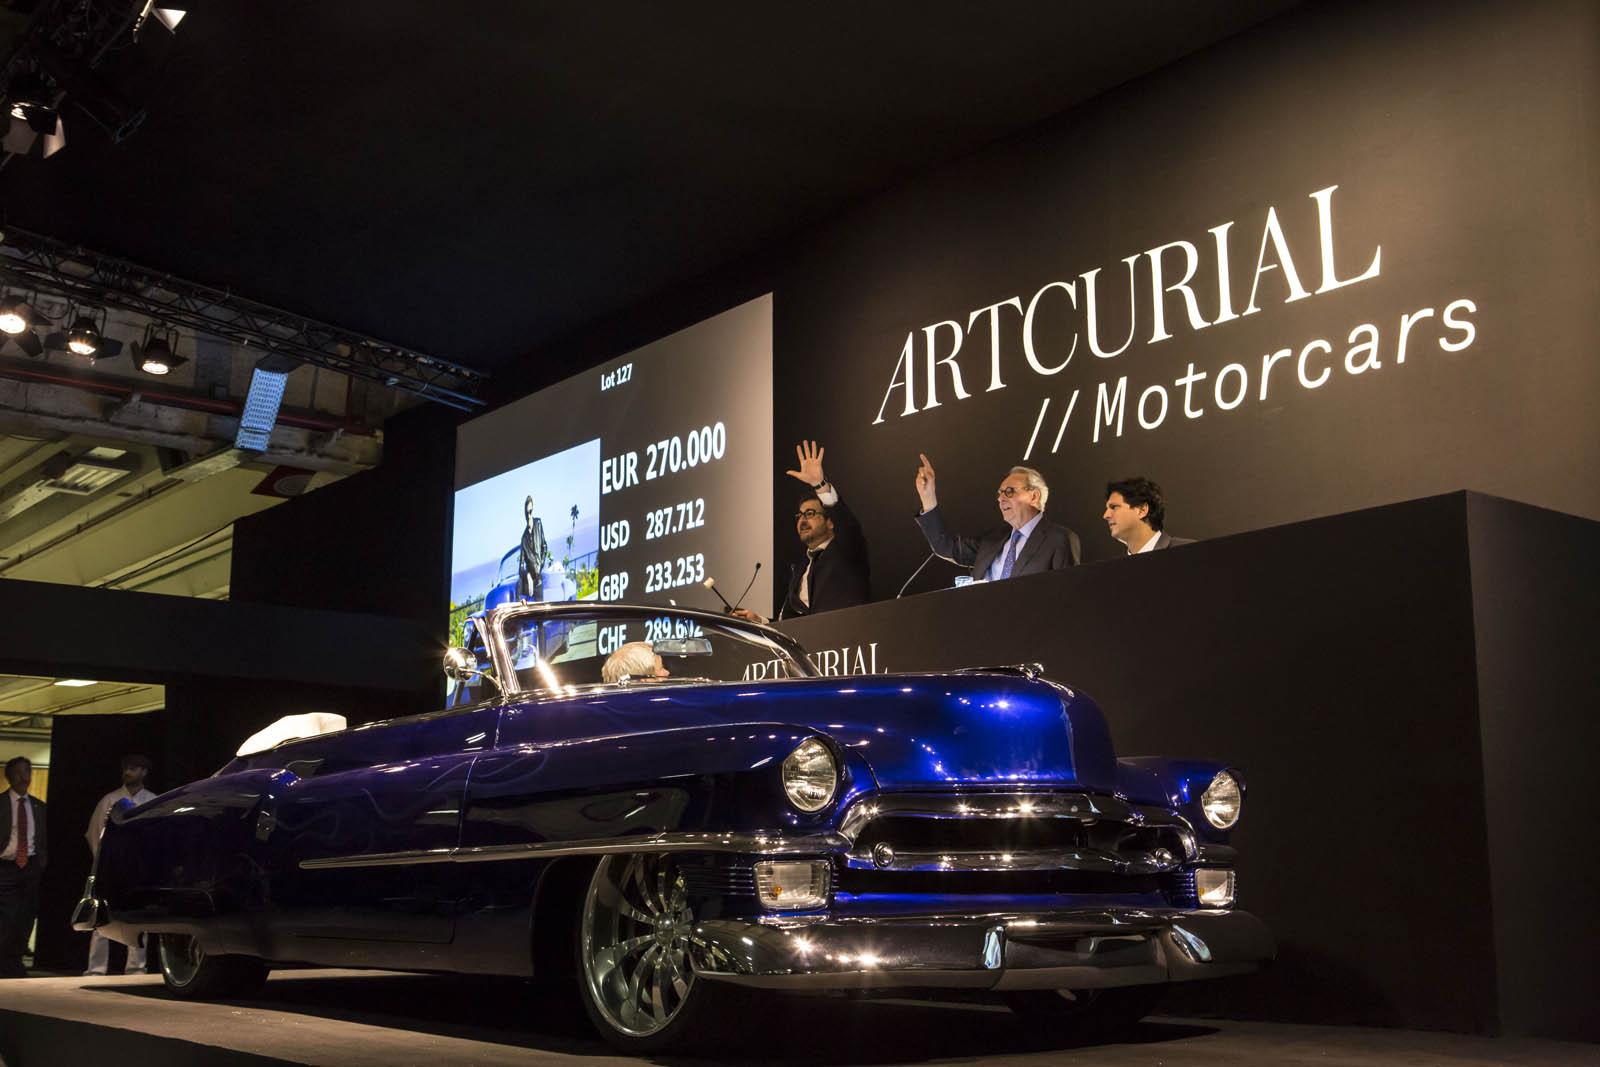 Lot+127+1953+Cadillac+Serie+62+Cabriolet+Custom+par+Boyd+Coddington+%C2%A9Artcurial+copy